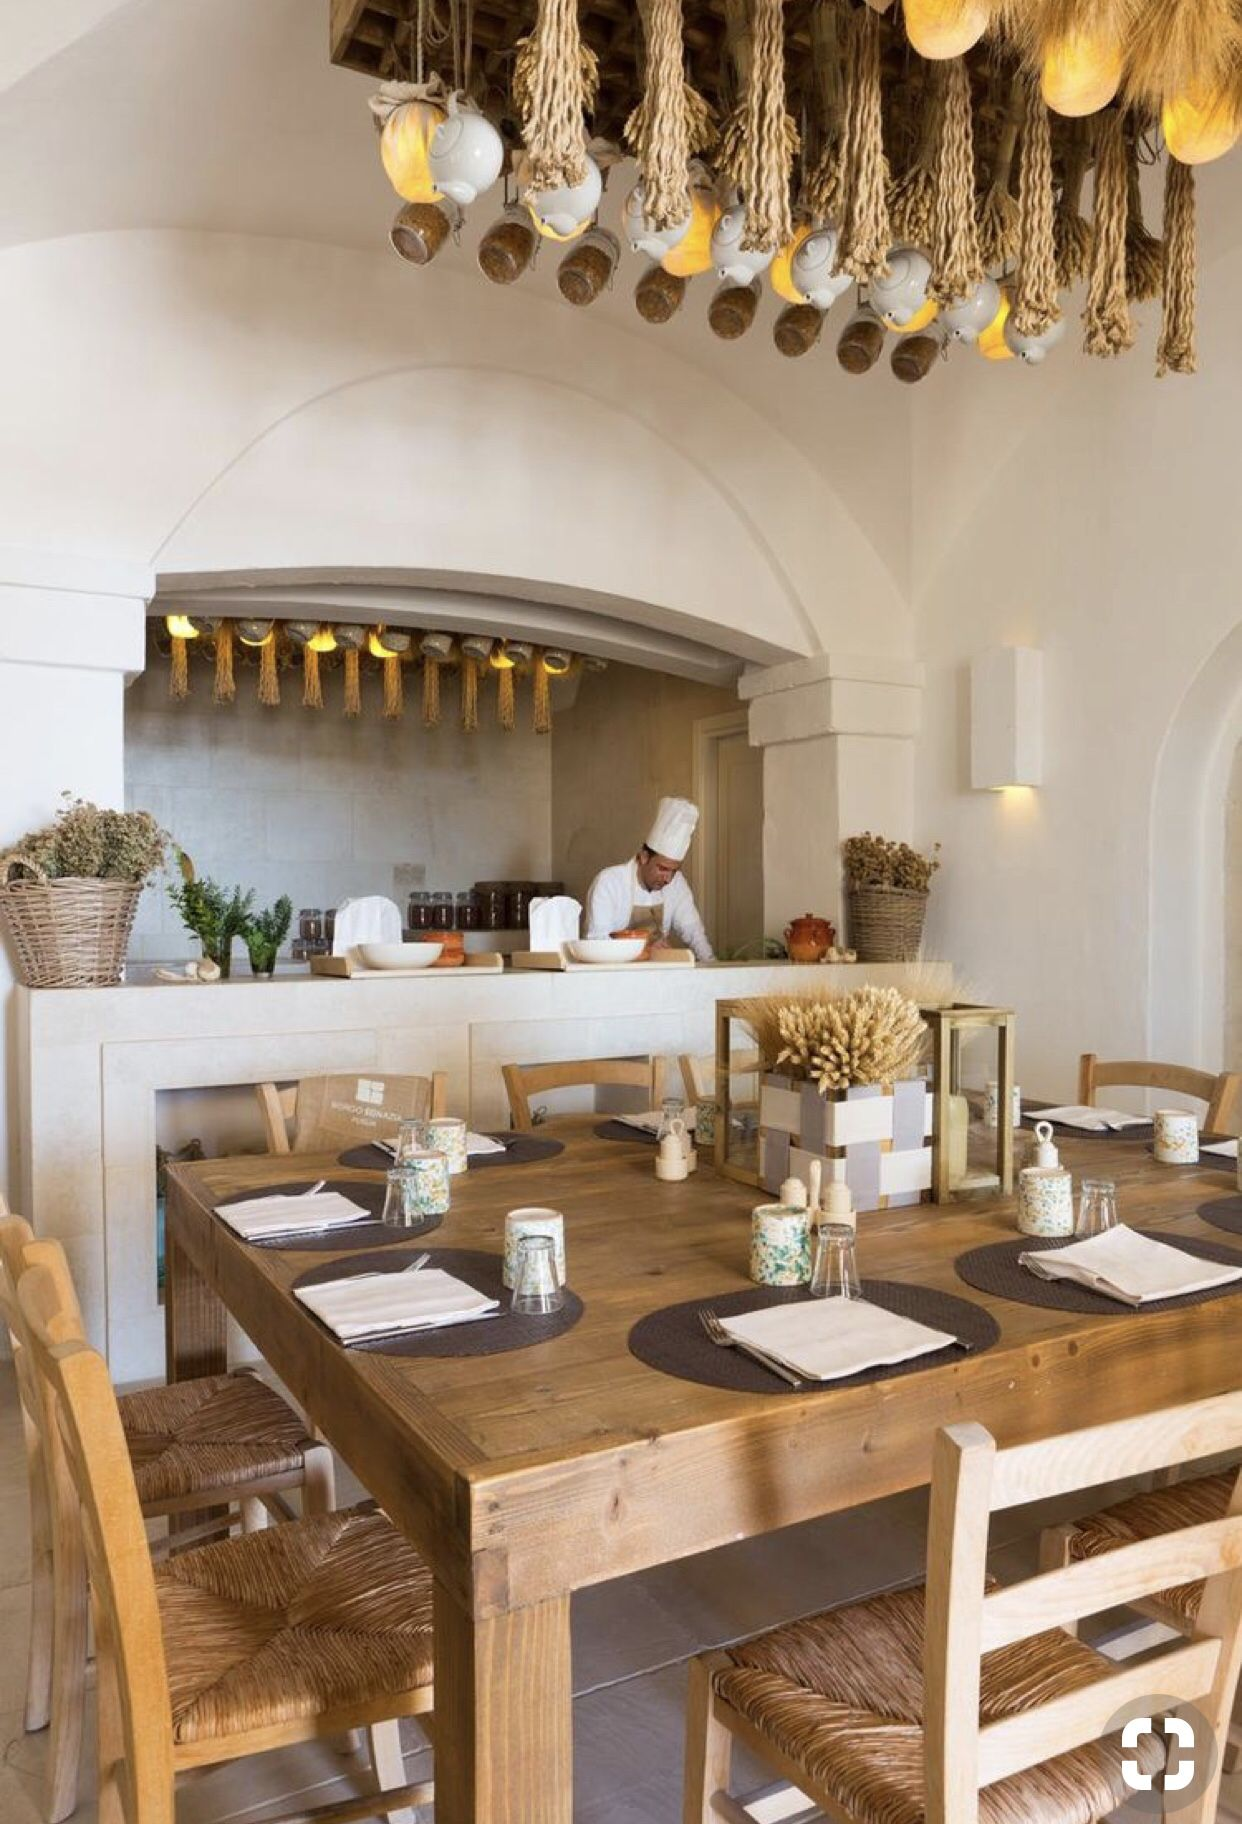 Pin by TANYA LITKOVSKA on INSPIRATION | Restaurant ...